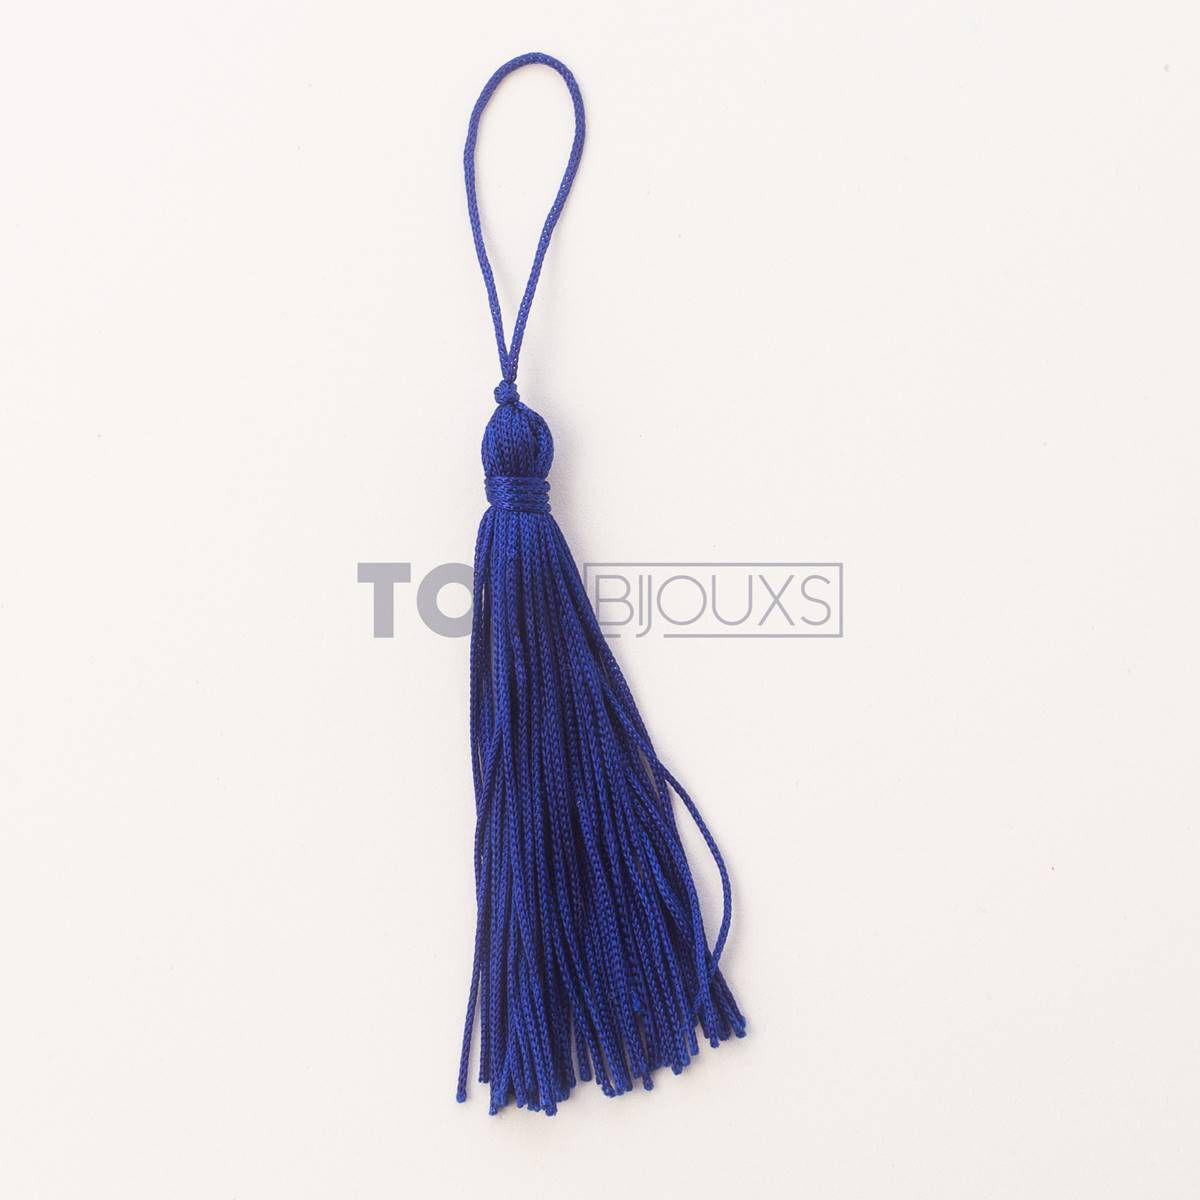 Pingente De Seda - Tassel - Azul Royal - 100 Unid